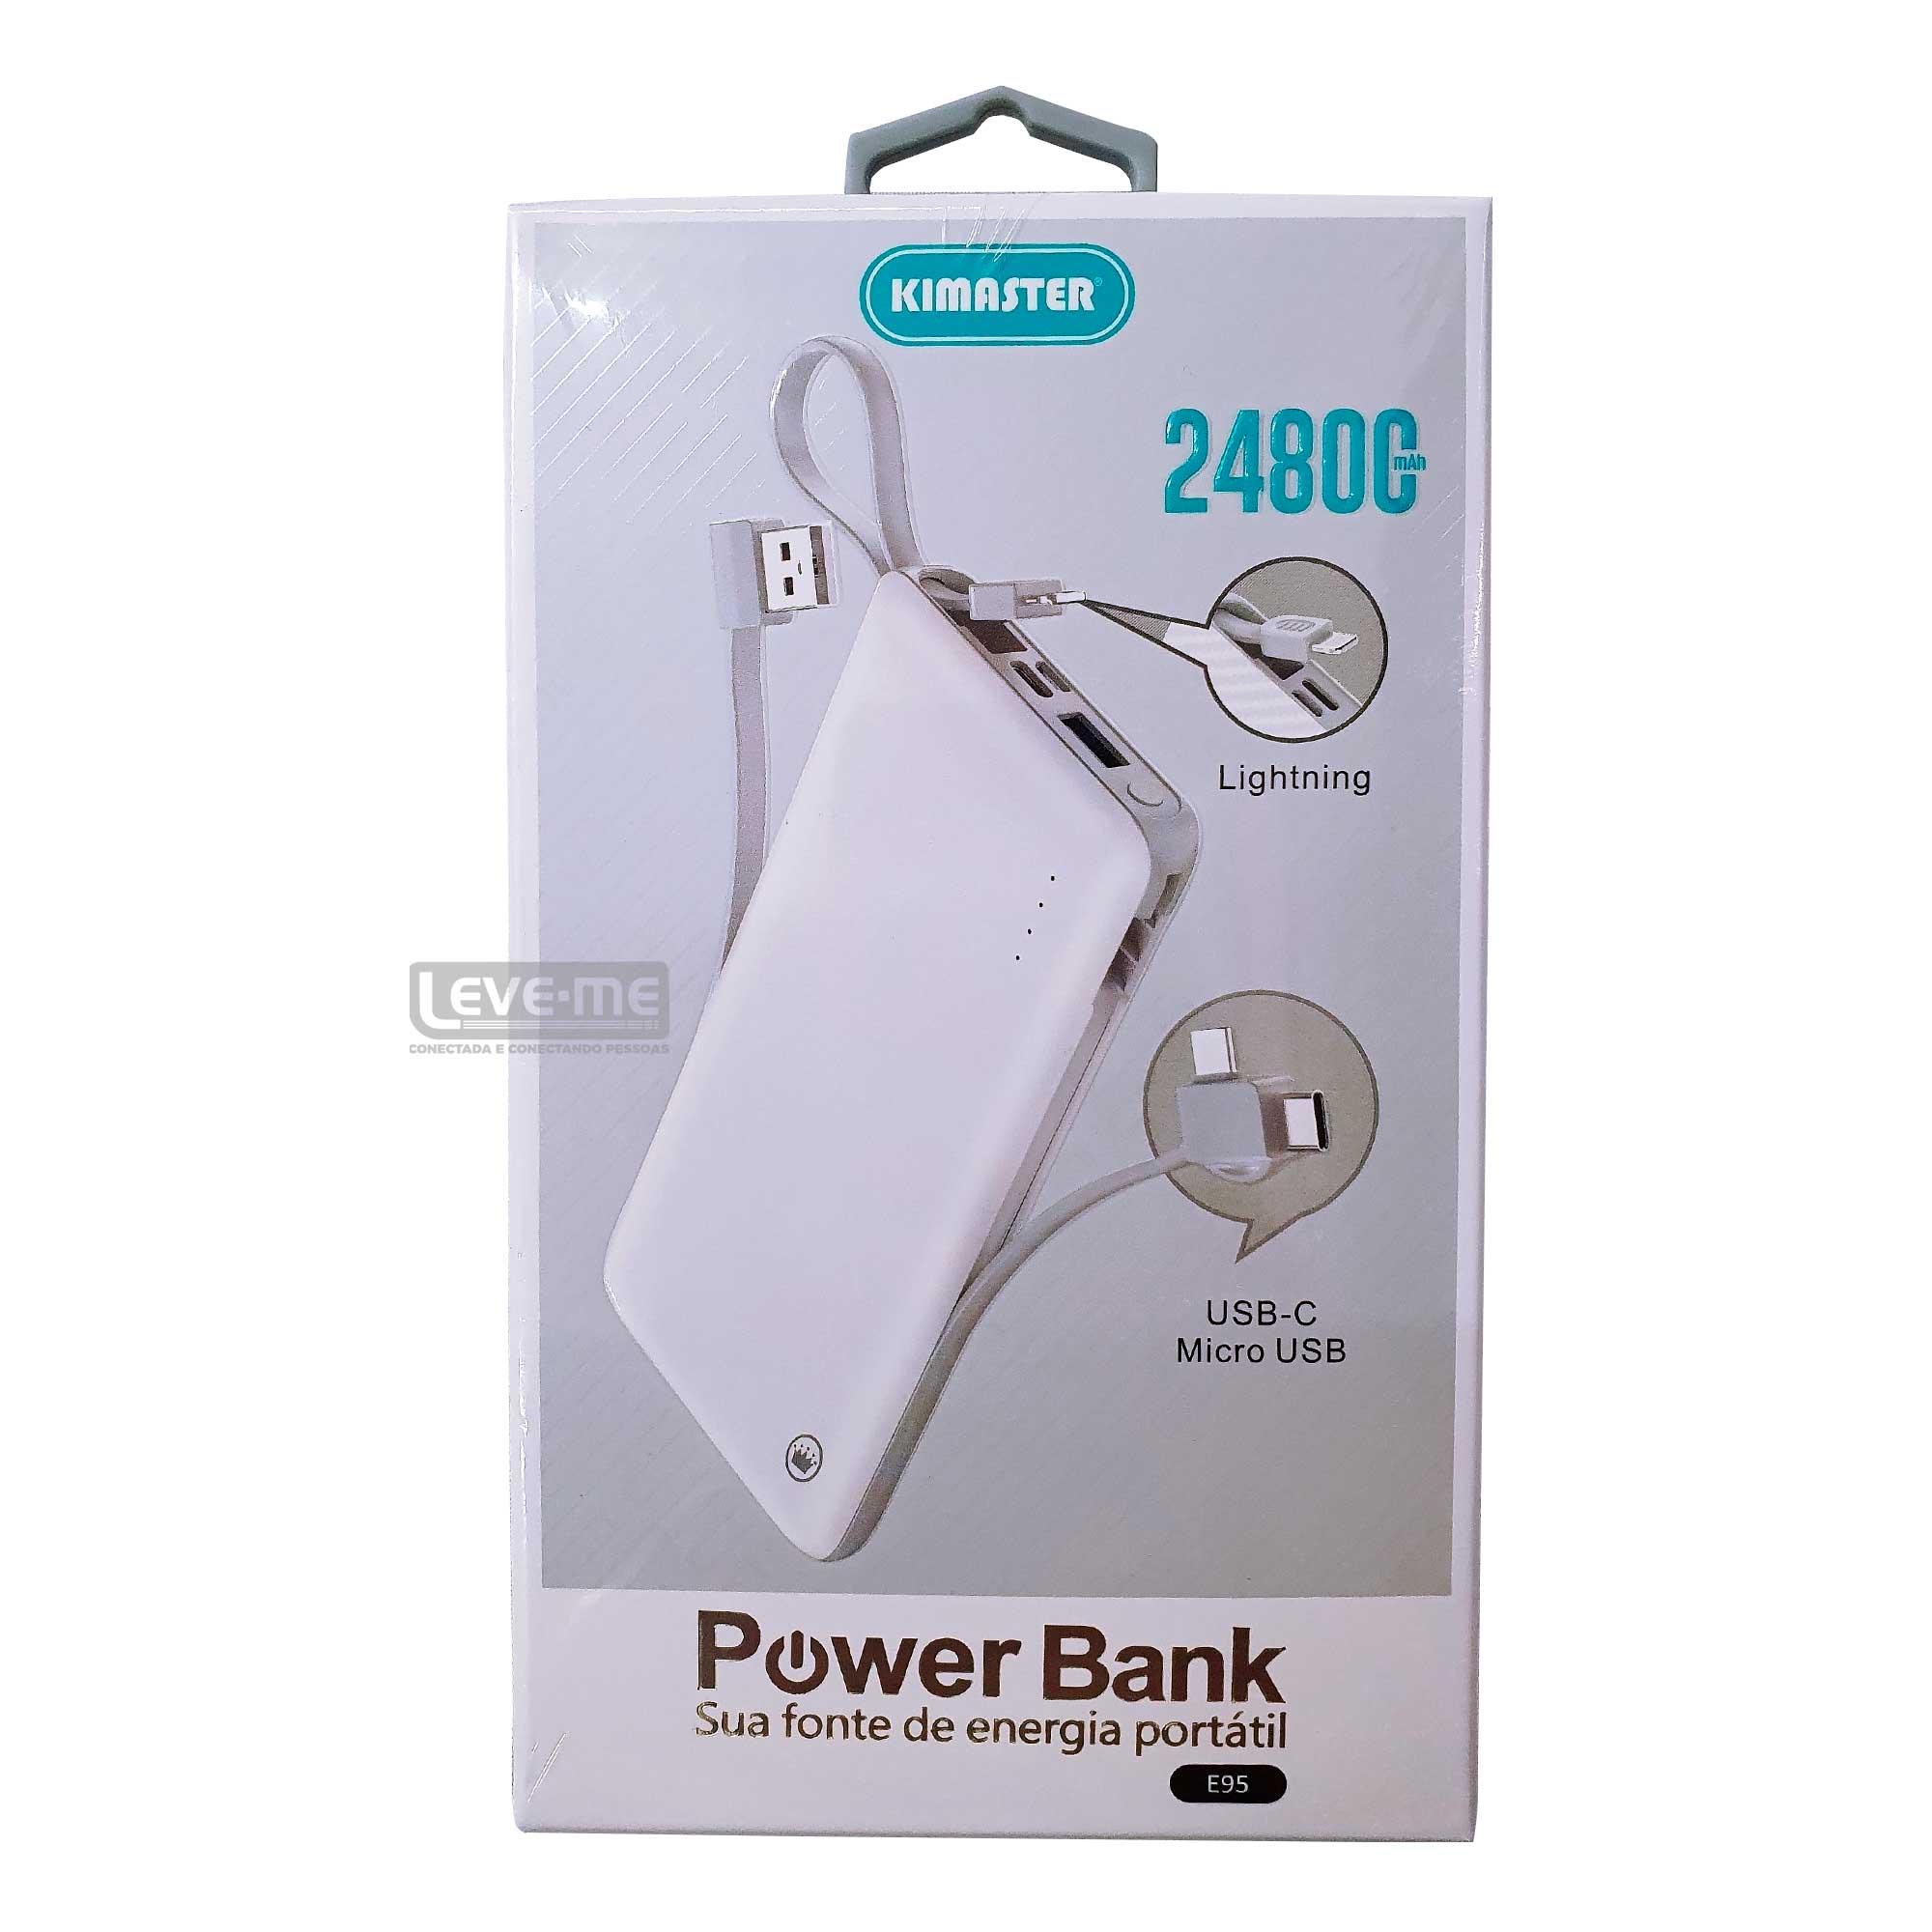 Power Bank com cabo removível 24800MAH